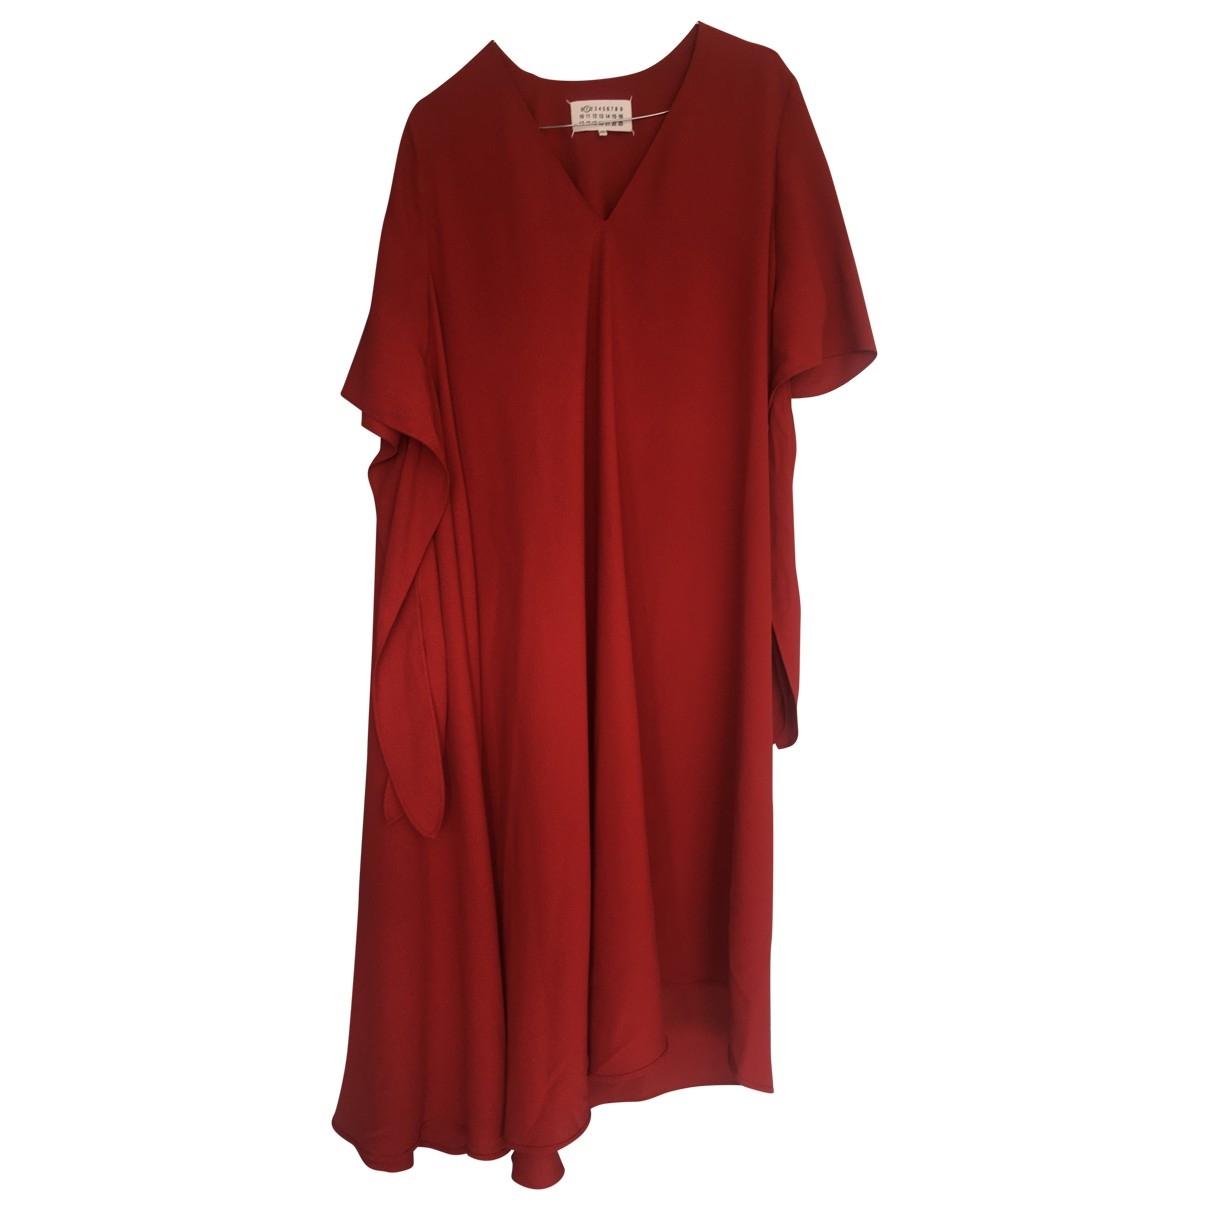 Maison Martin Margiela - Robe   pour femme - rouge